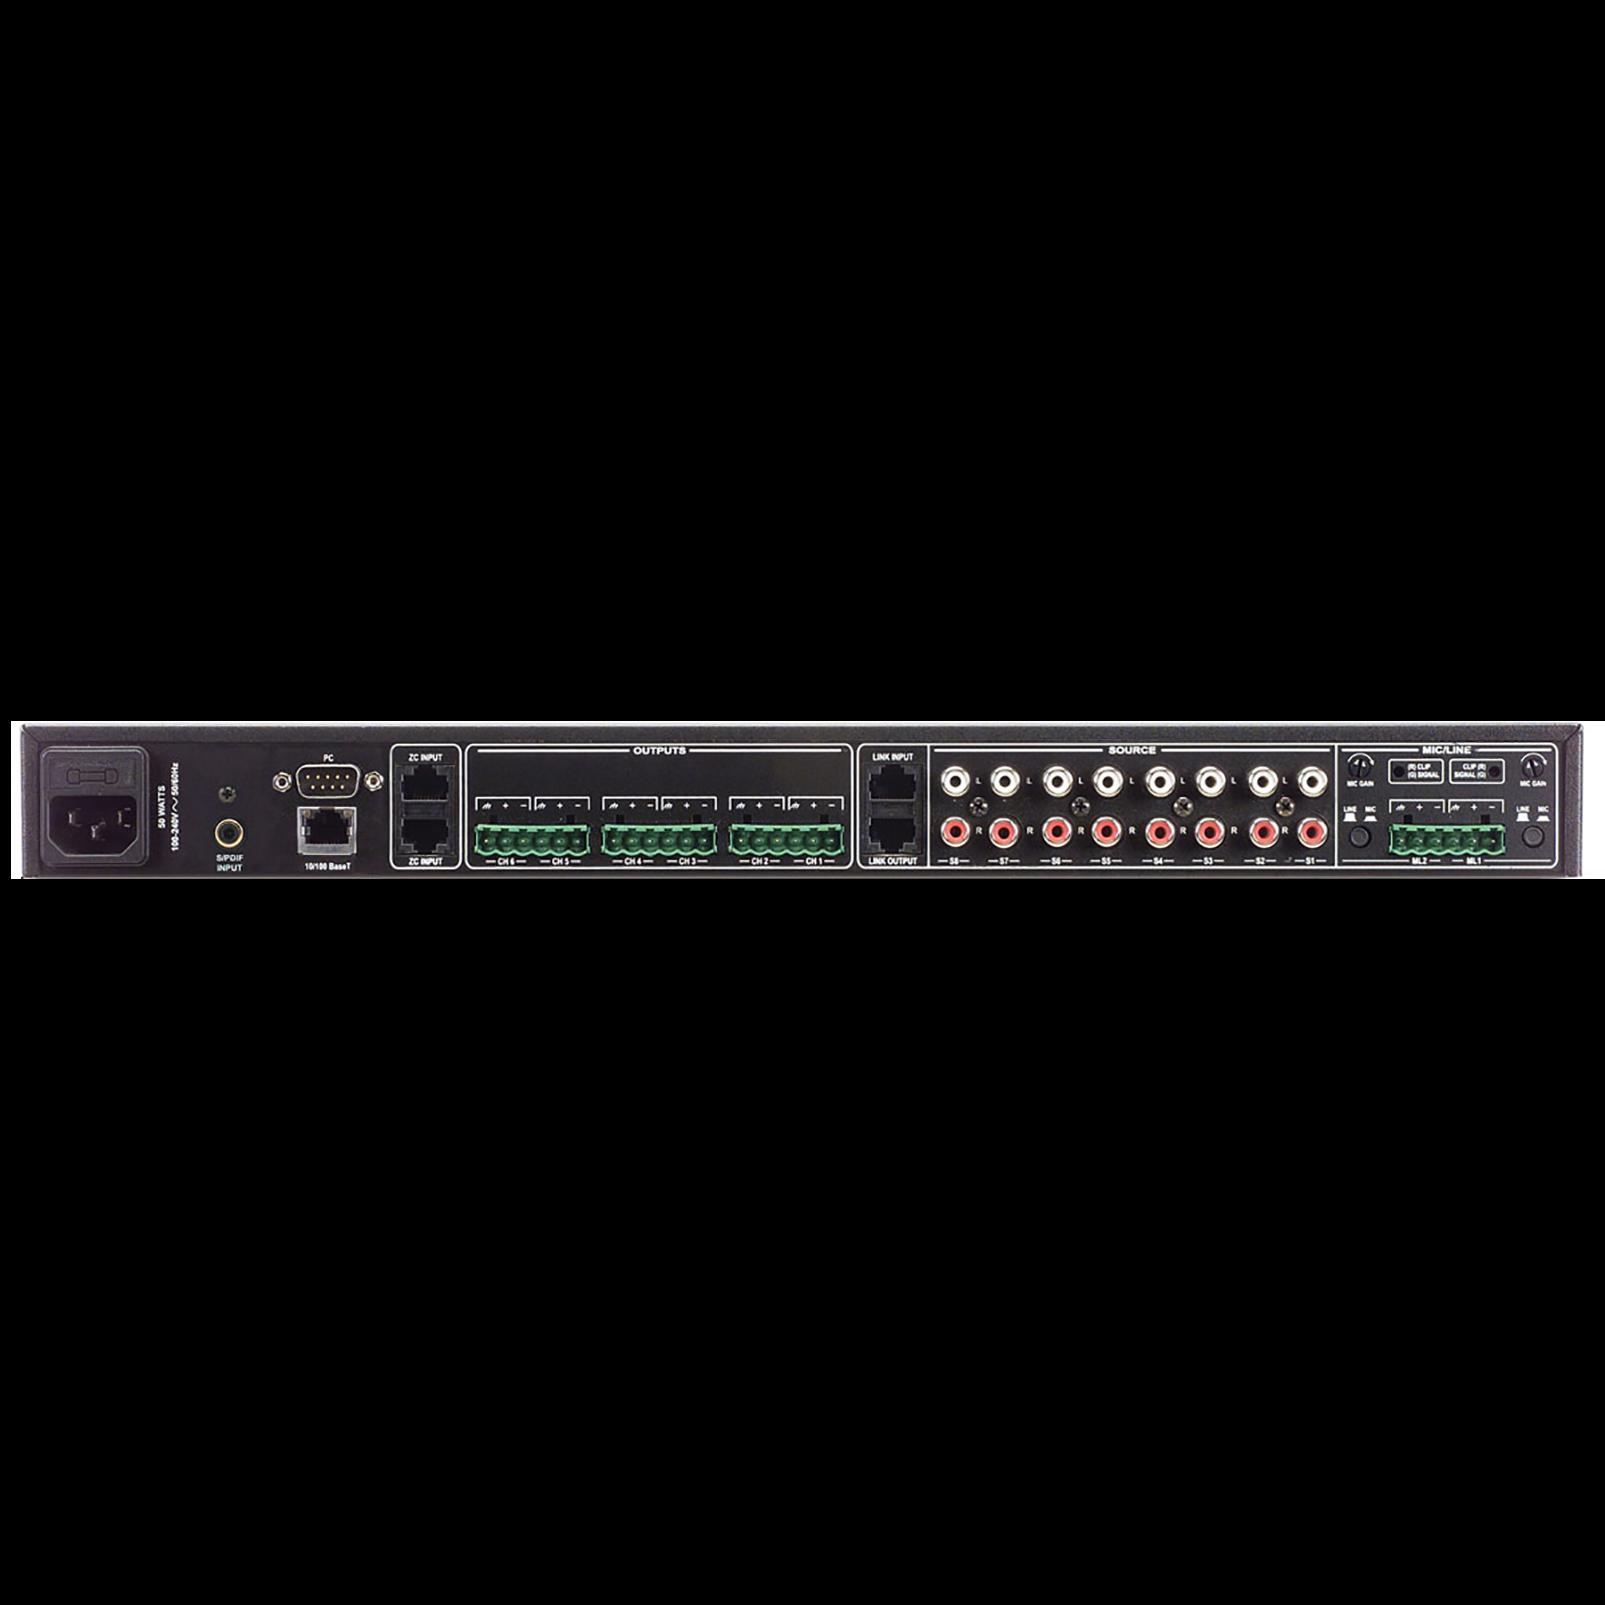 ZonePro 1260 - Black - 12x6 Digital Zone Processor - Back